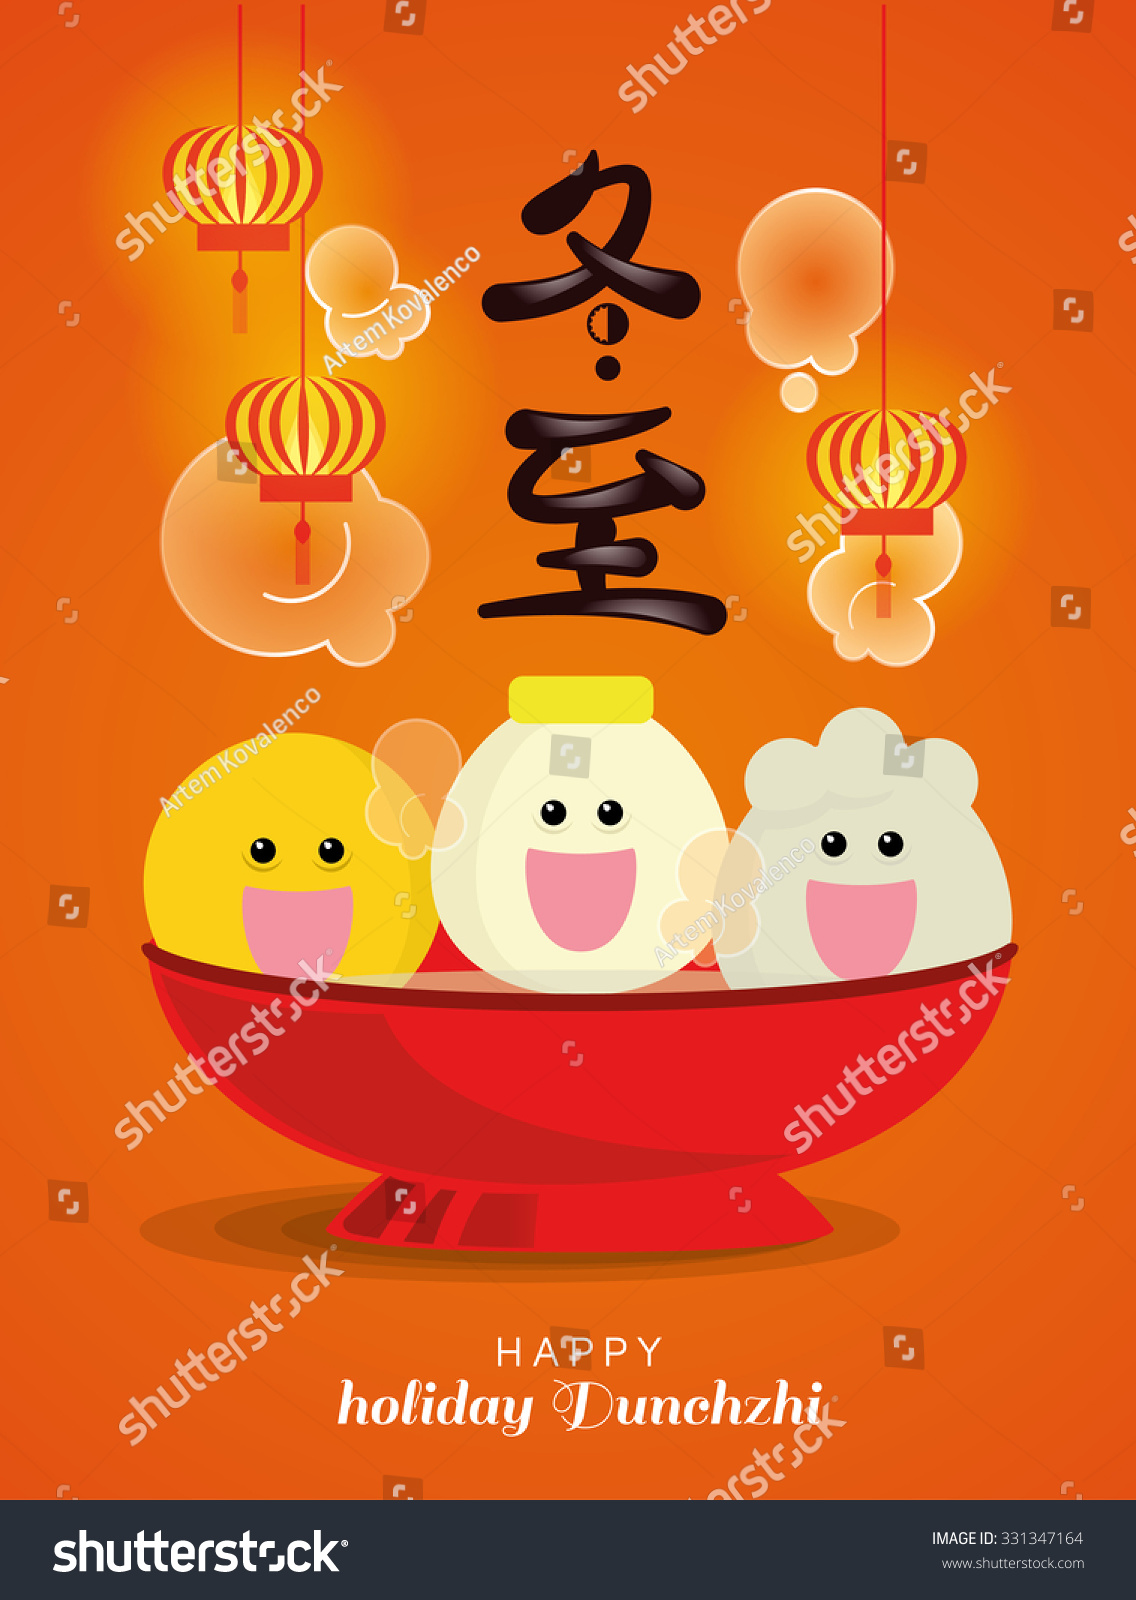 Vector Illustration Chinese Festival Dunchzhi Winter Stock Vector